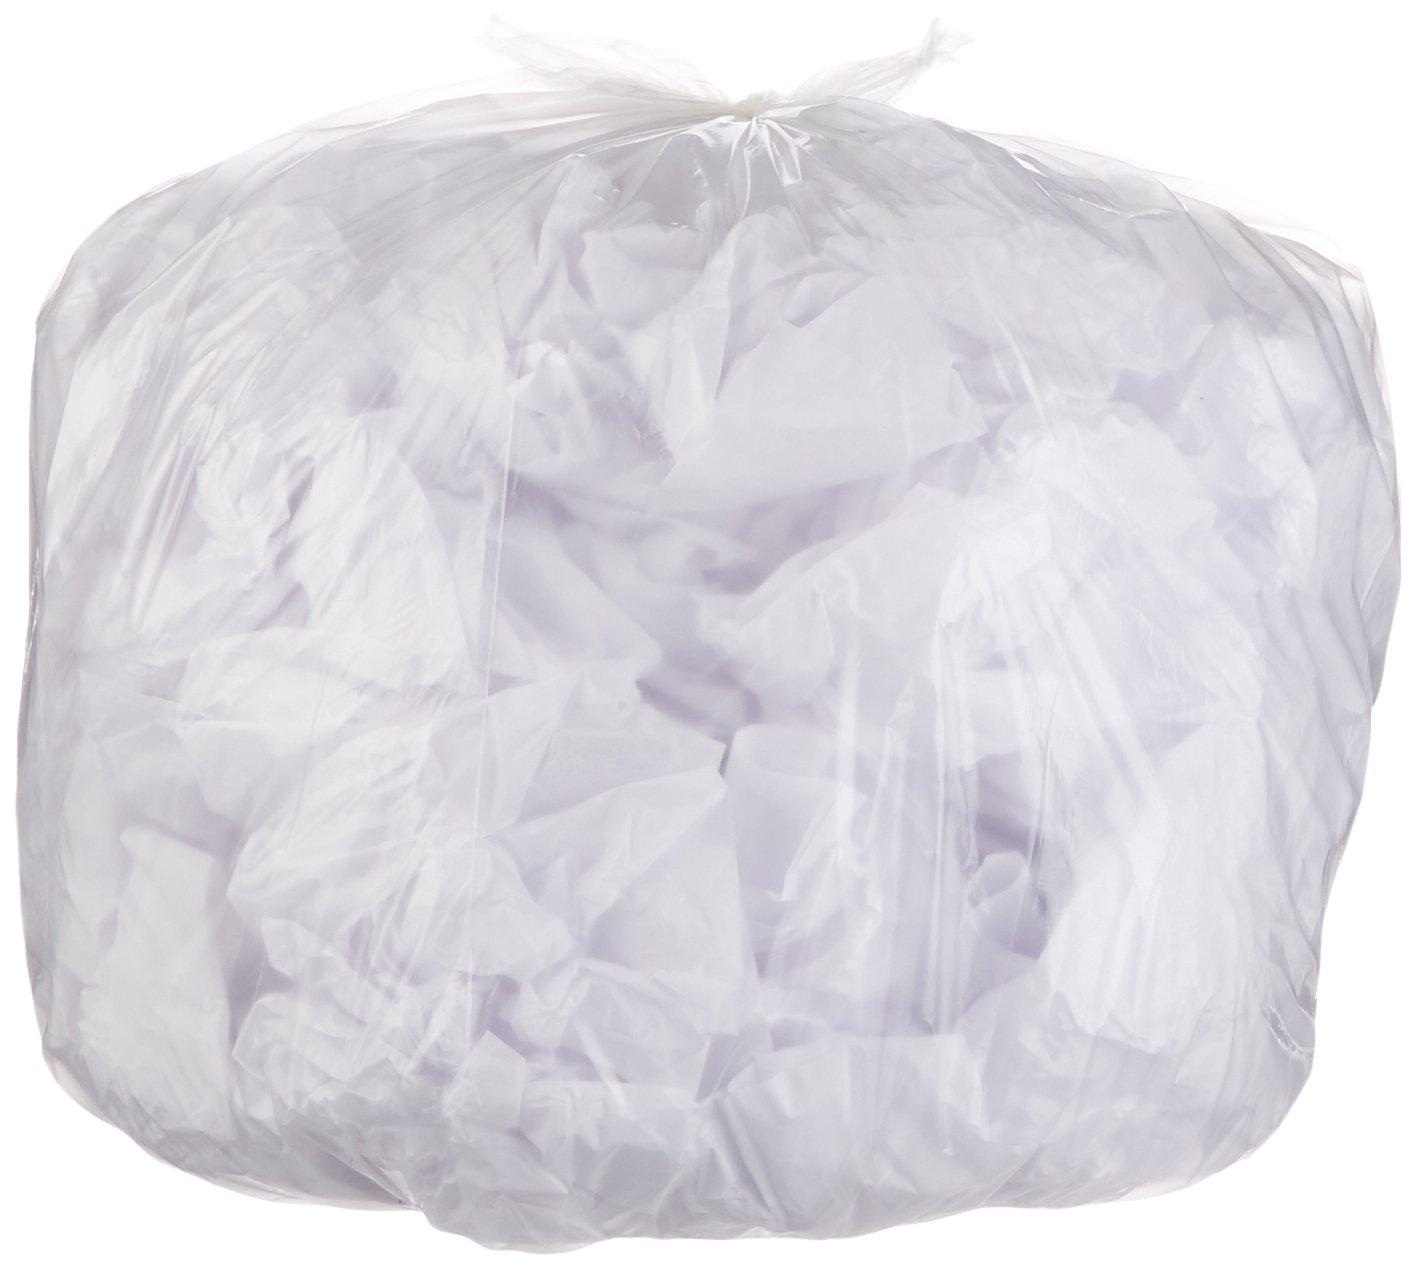 9ade3abd4b5 Amazon.com  AmazonBasics 45 Gallon Recycling Trash Bag